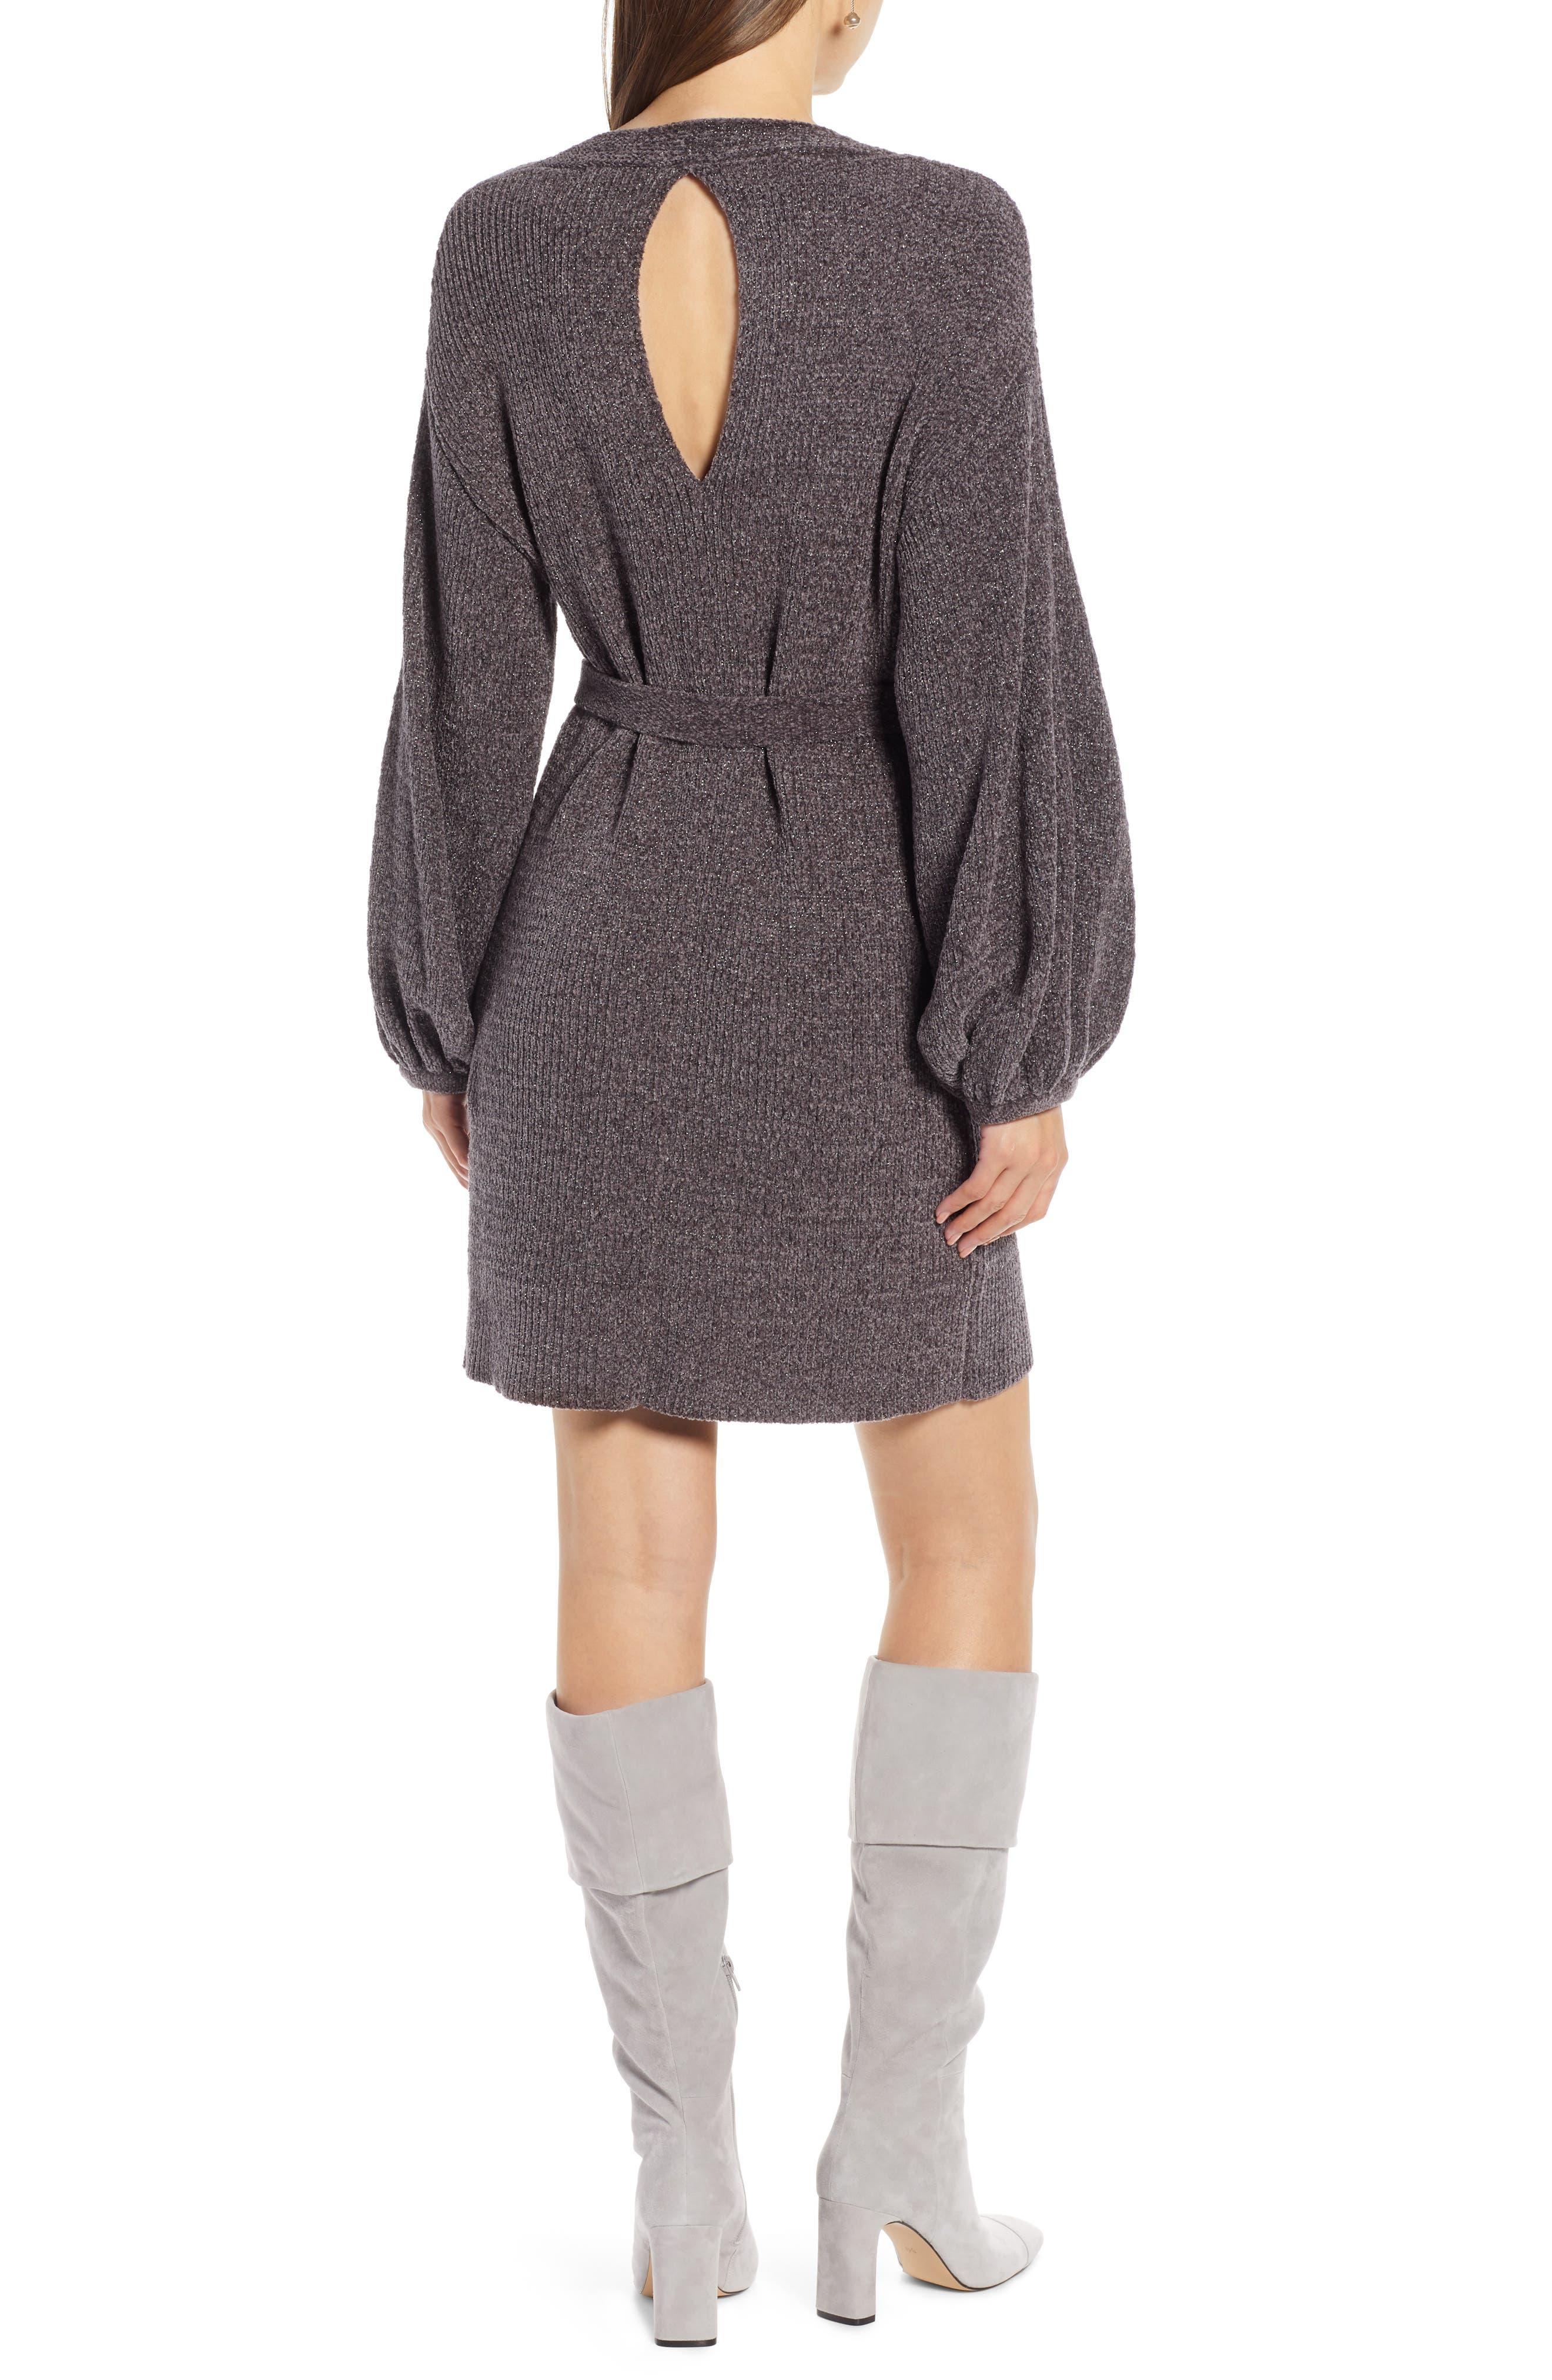 Something Navy Shimmer Sweater Dress Nordstrom Exclusive Nordstrom